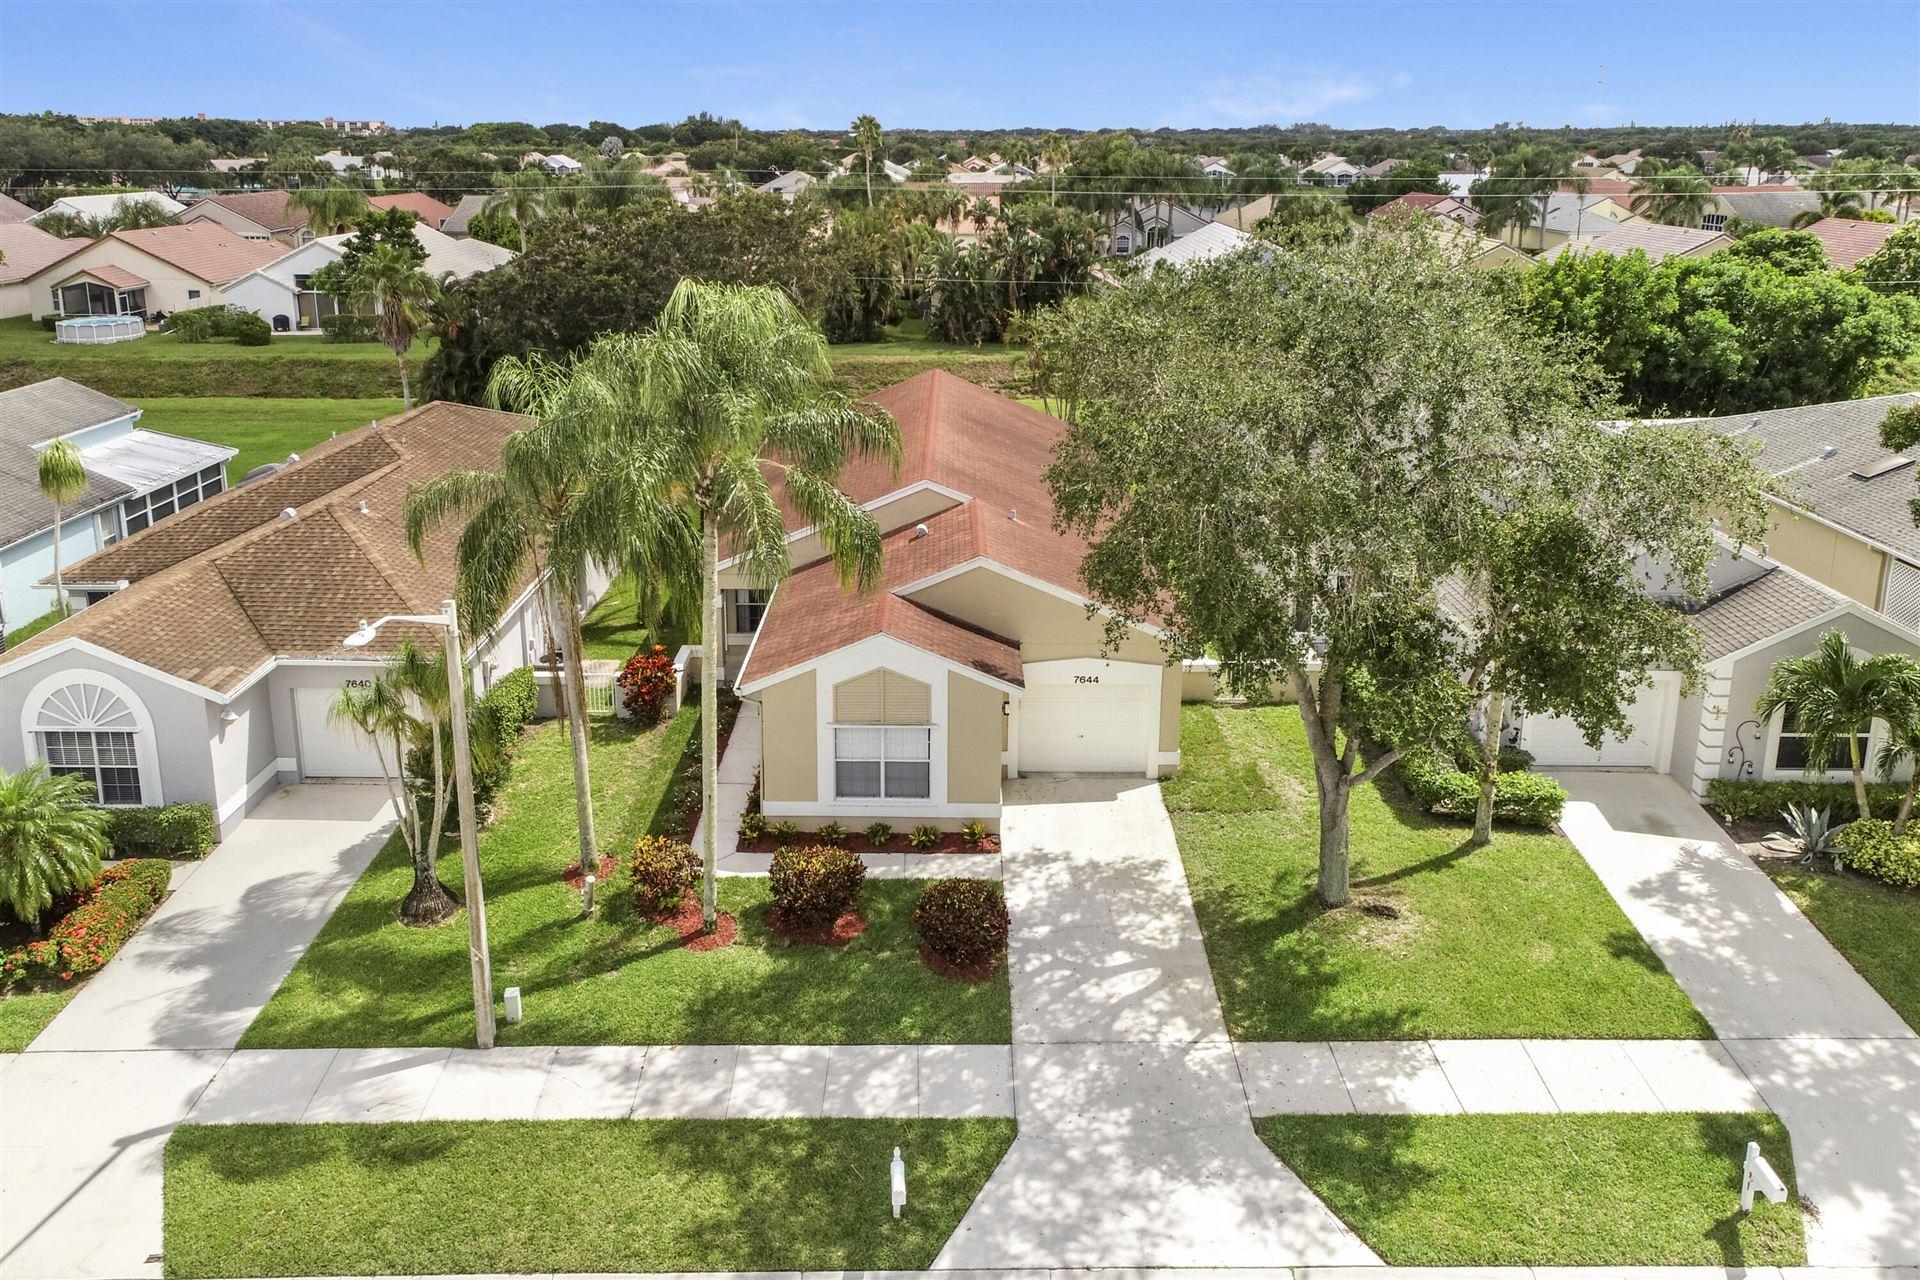 7644 Mansfield Hollow Road, Delray Beach, FL 33446 - MLS#: RX-10743012